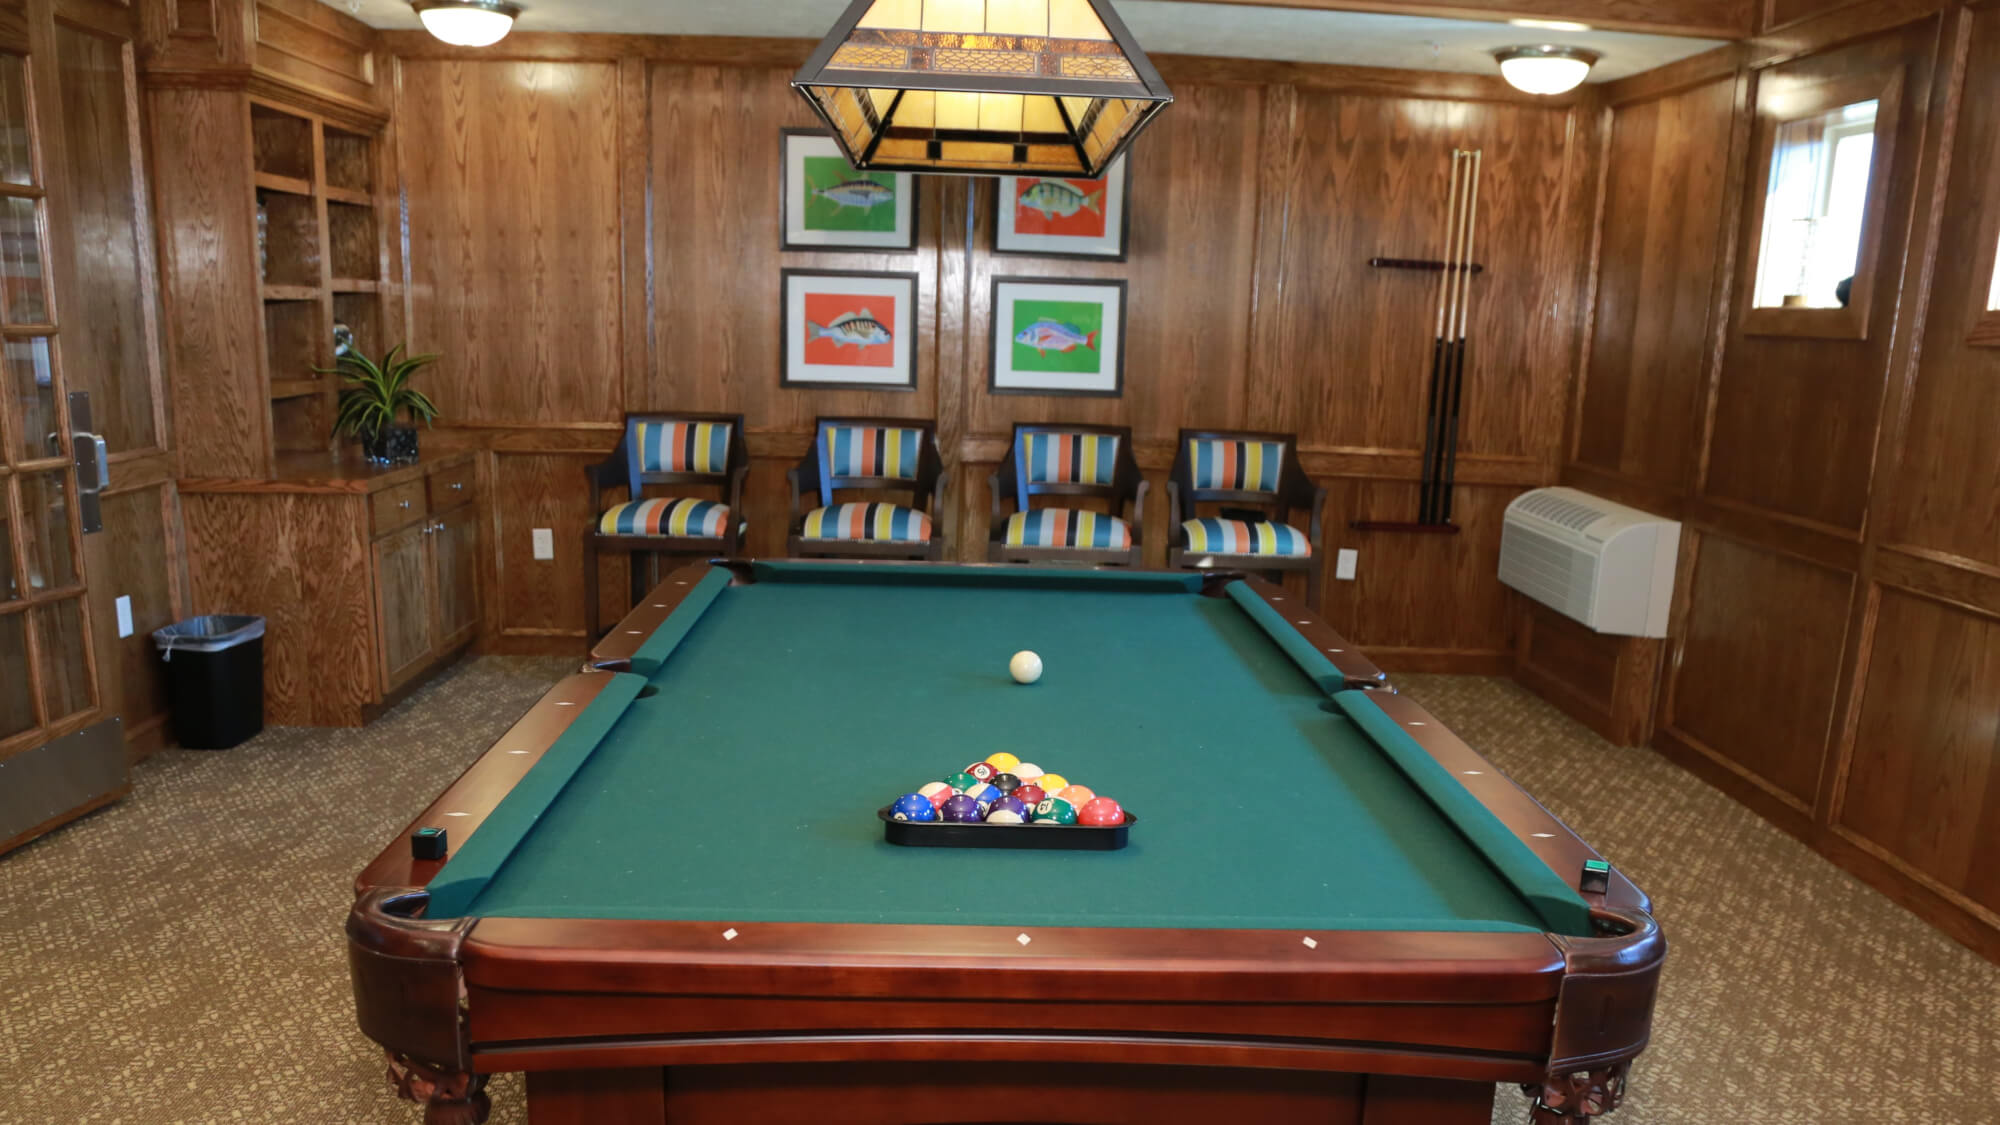 Billiards room at Cactus Valley